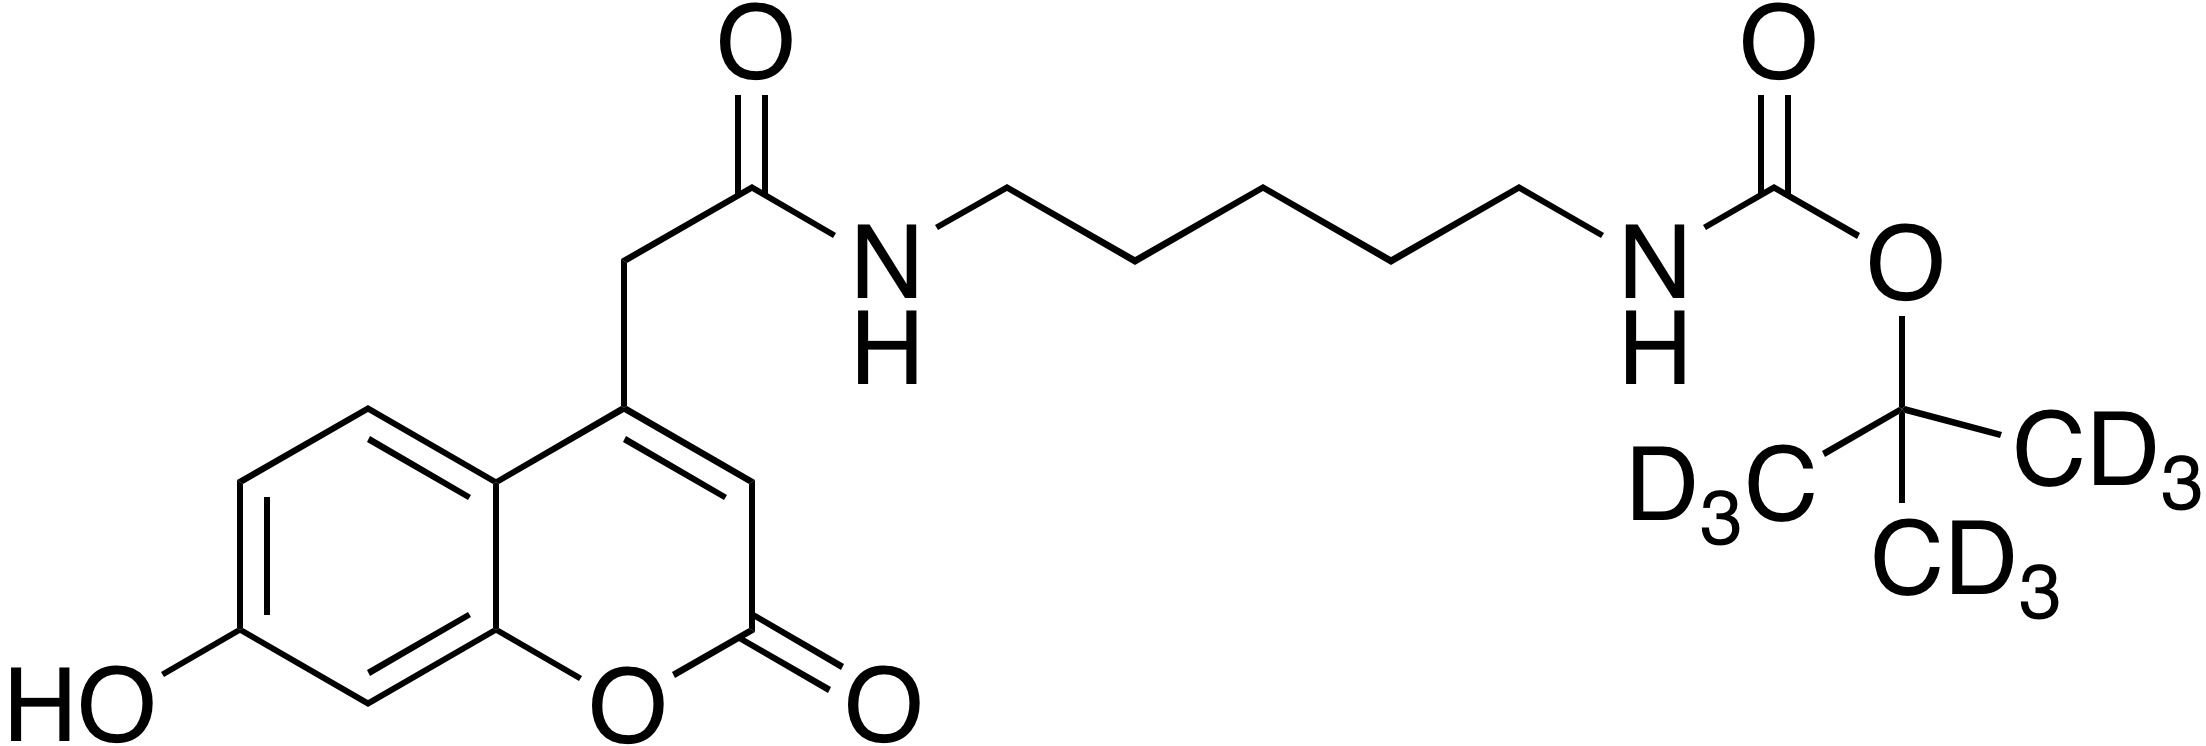 tert-Butyl-d<sub>9</sub> 5-(7-hydroxy-coumarin-4-acetamido)pentyl carbamate